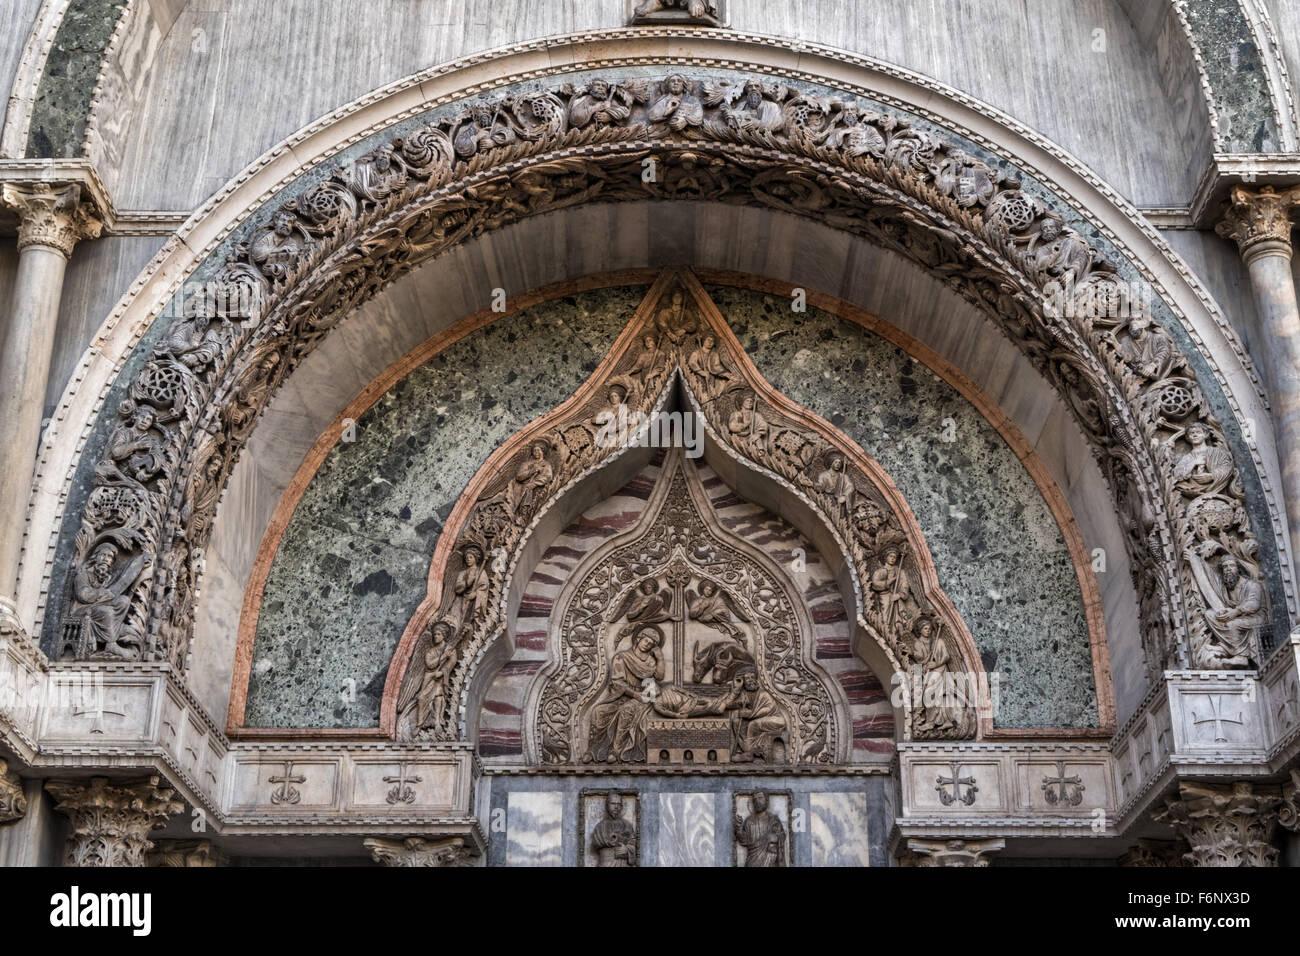 Reich verzierte Bogen über dem Eingang zum Dogenpalast Venedig Stockbild